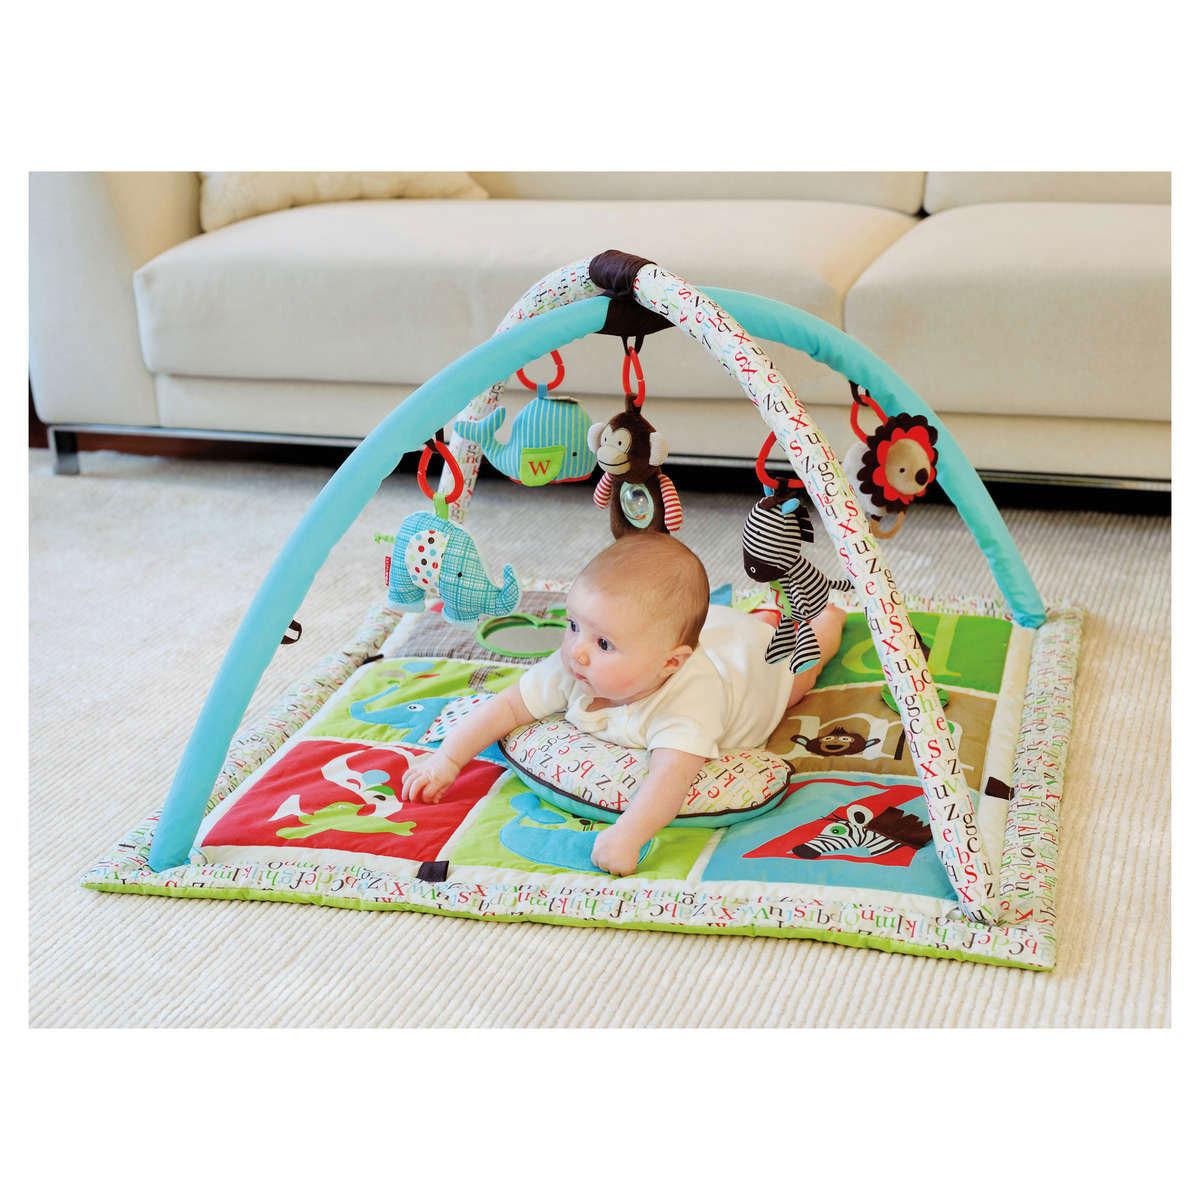 skip hop tapis d 39 veil abc zoo tapis veil skip hop sur. Black Bedroom Furniture Sets. Home Design Ideas